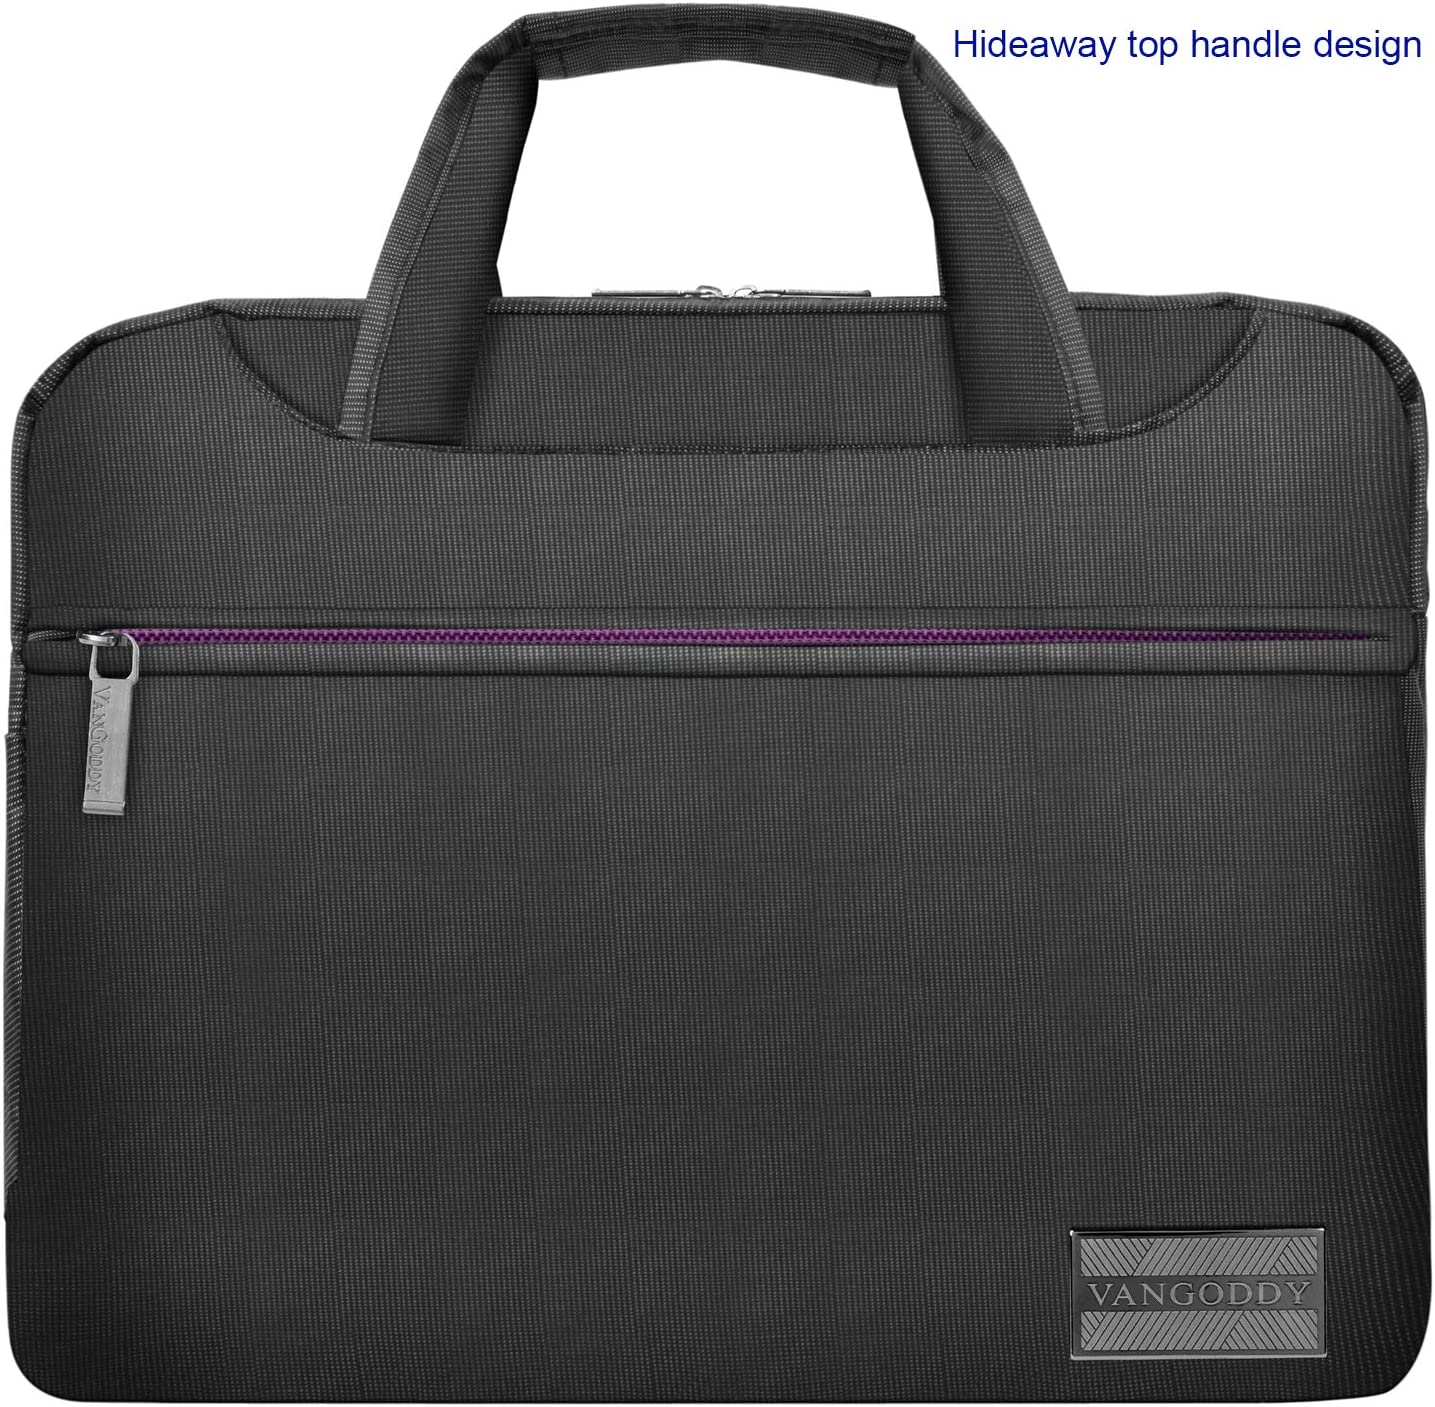 X1 Yoga 14 Inch Series X1 Titanium Yoga 13 14 in Laptop Bag for Lenovo ThinkPad X1 Fold X1 Carbon